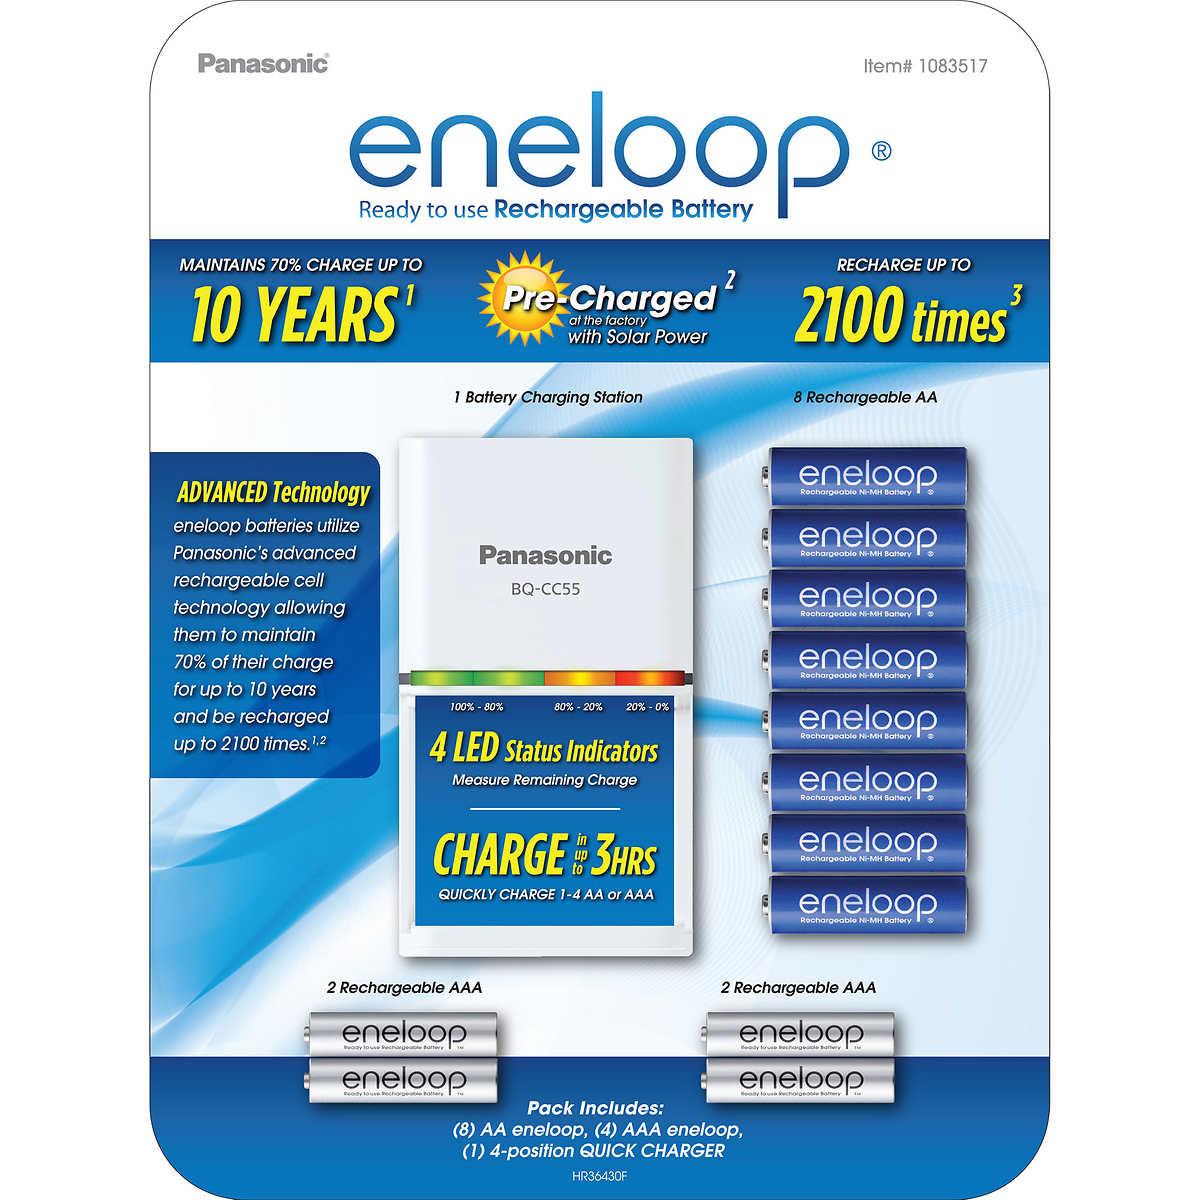 Costco Members: Panasonic Eneloop Rechargeable Battery Kit / 8 AA + 4 AAA + Quick Charger $19.99